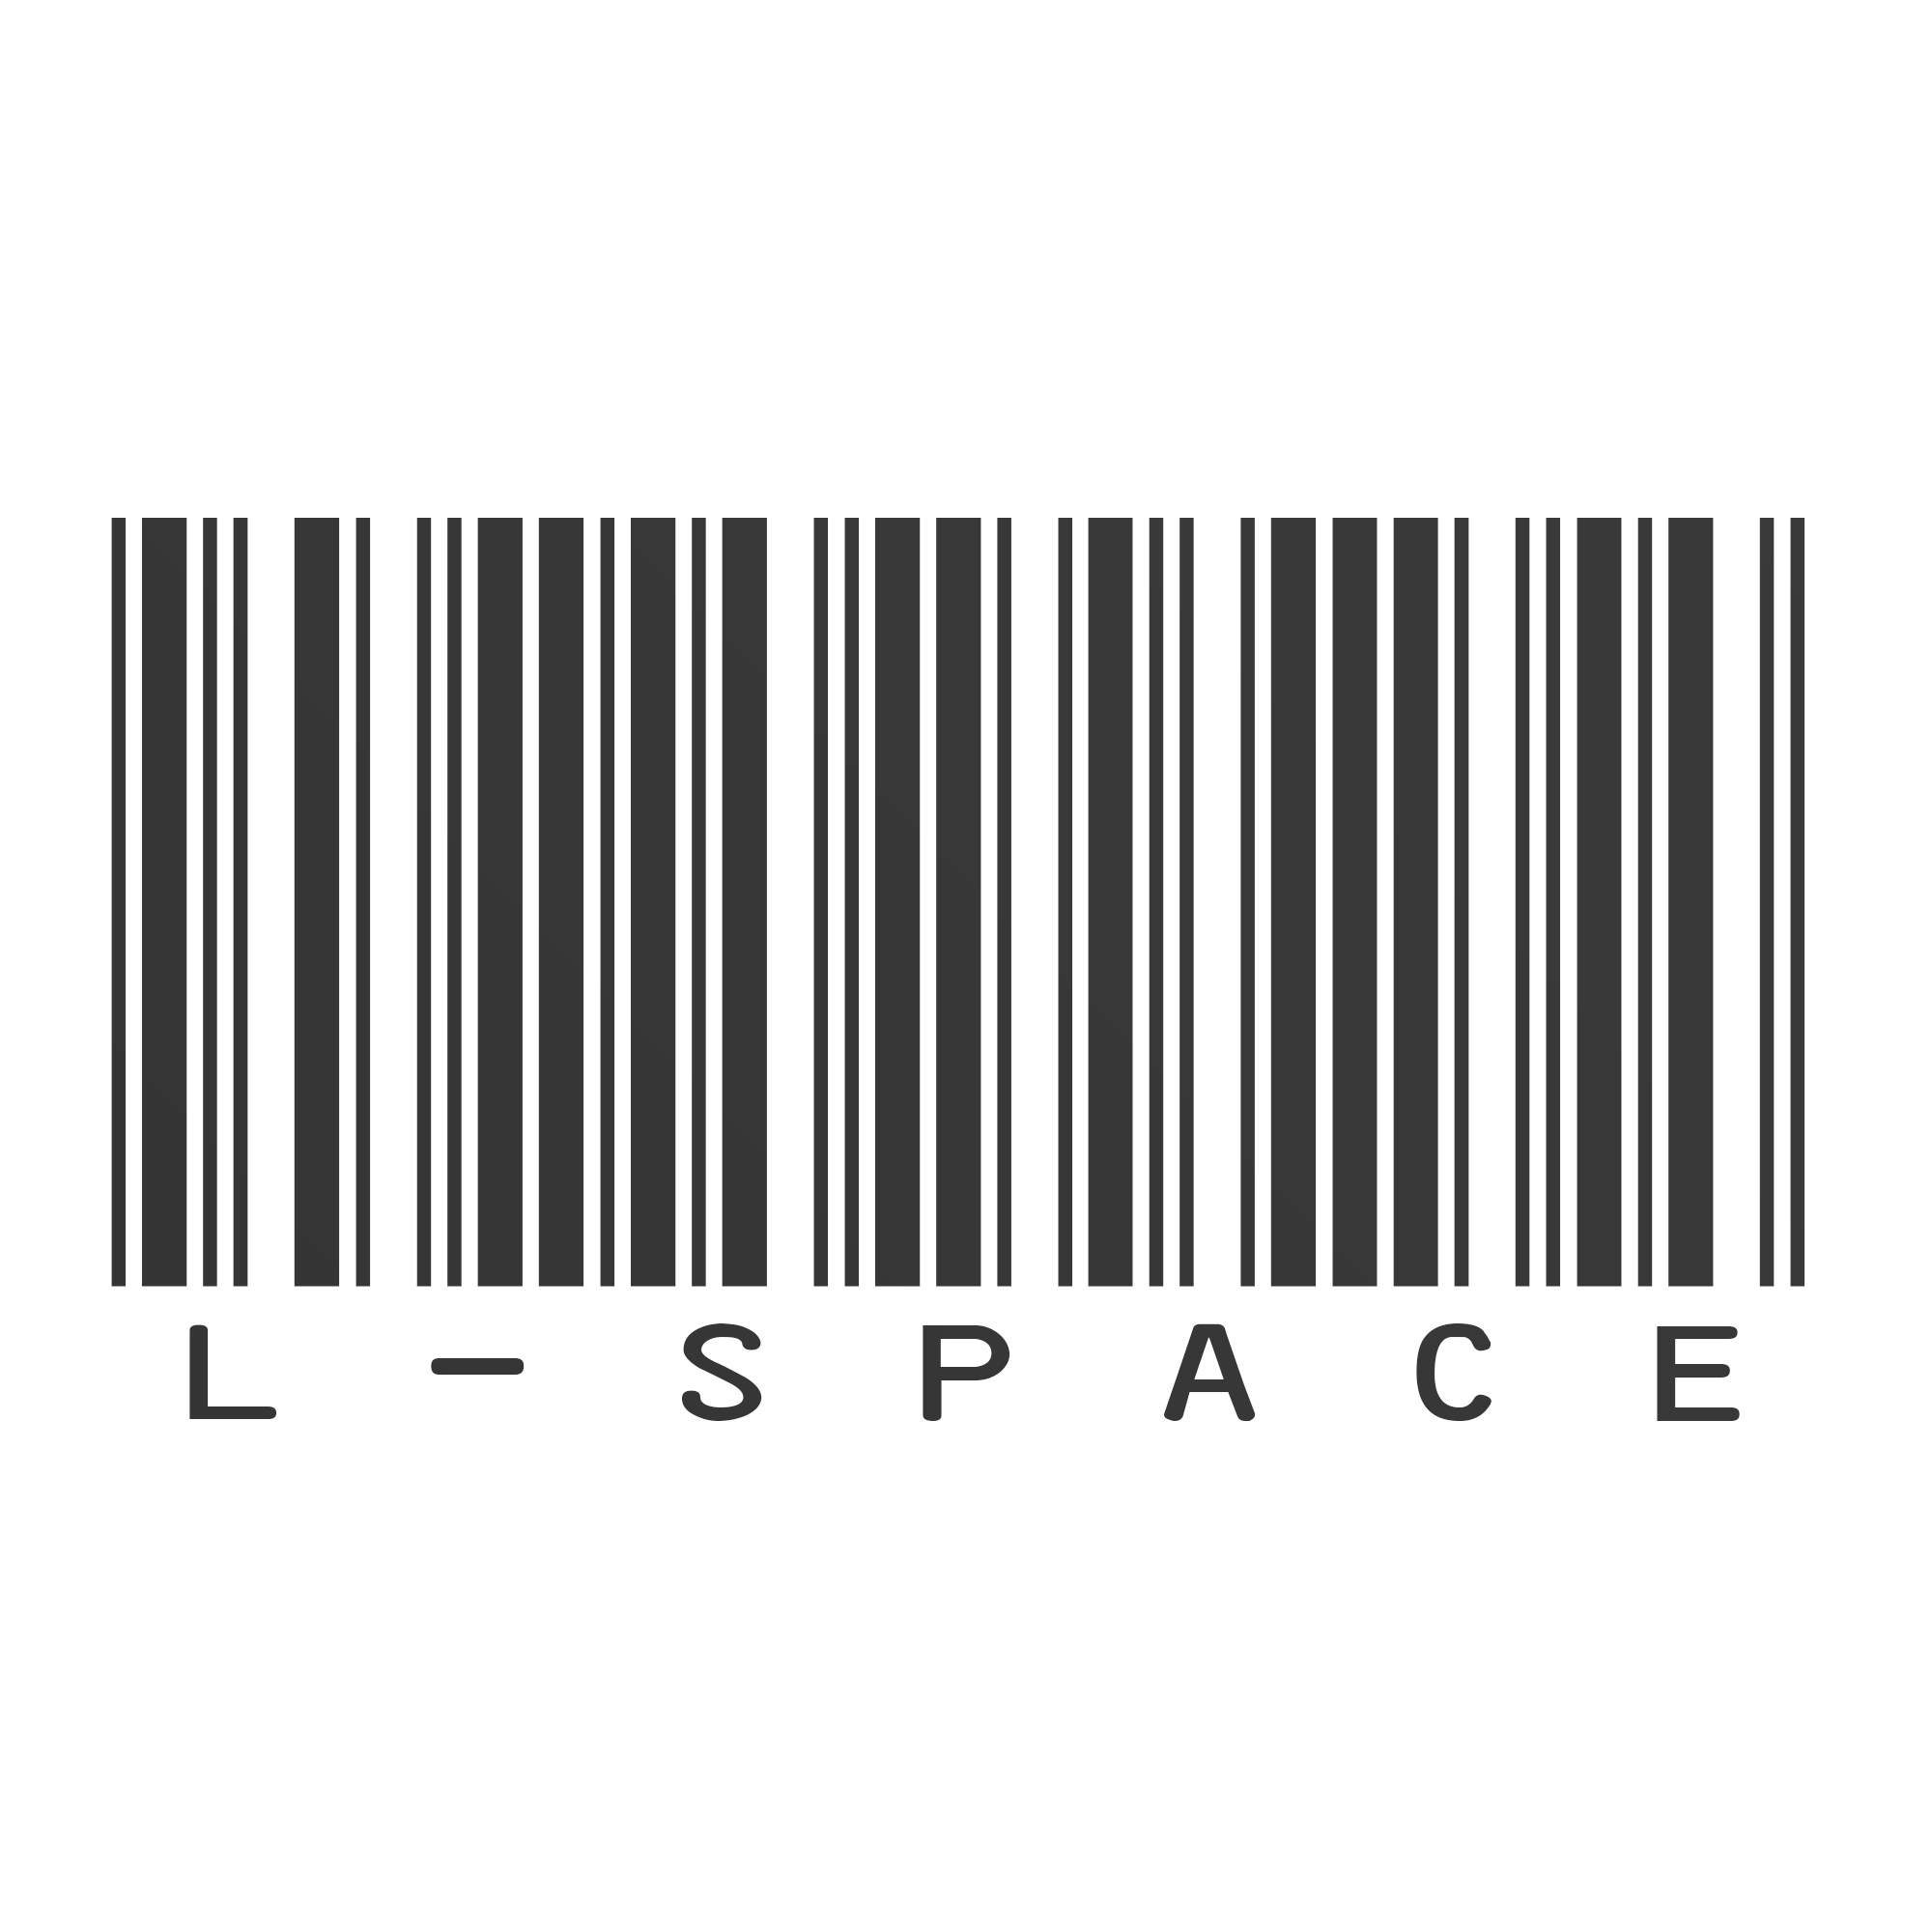 L-space 2019 logo.jpg